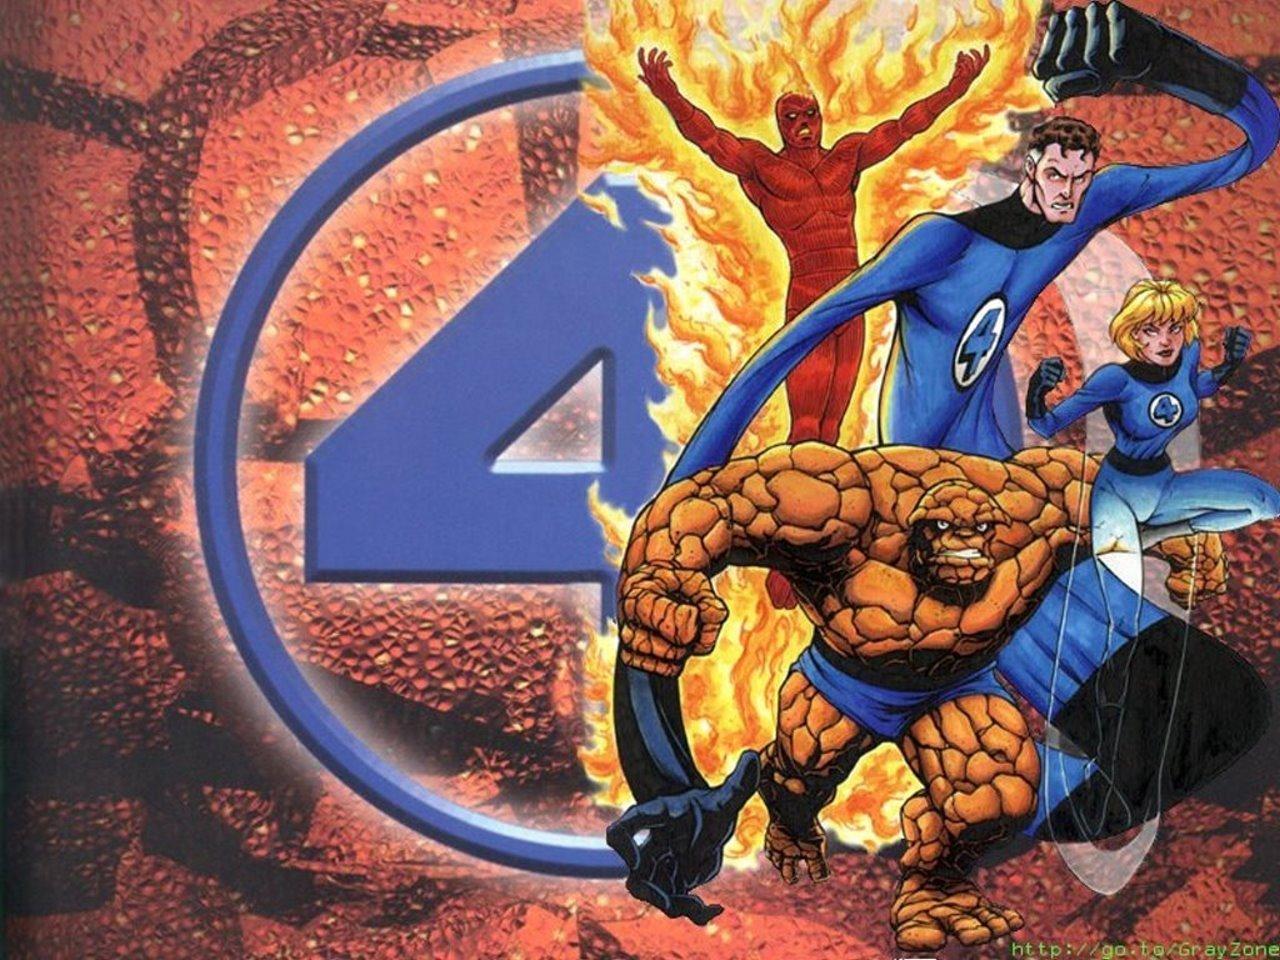 http://images2.fanpop.com/images/photos/5200000/Fantastic-Four-marvel-comics-5205641-1280-960.jpg